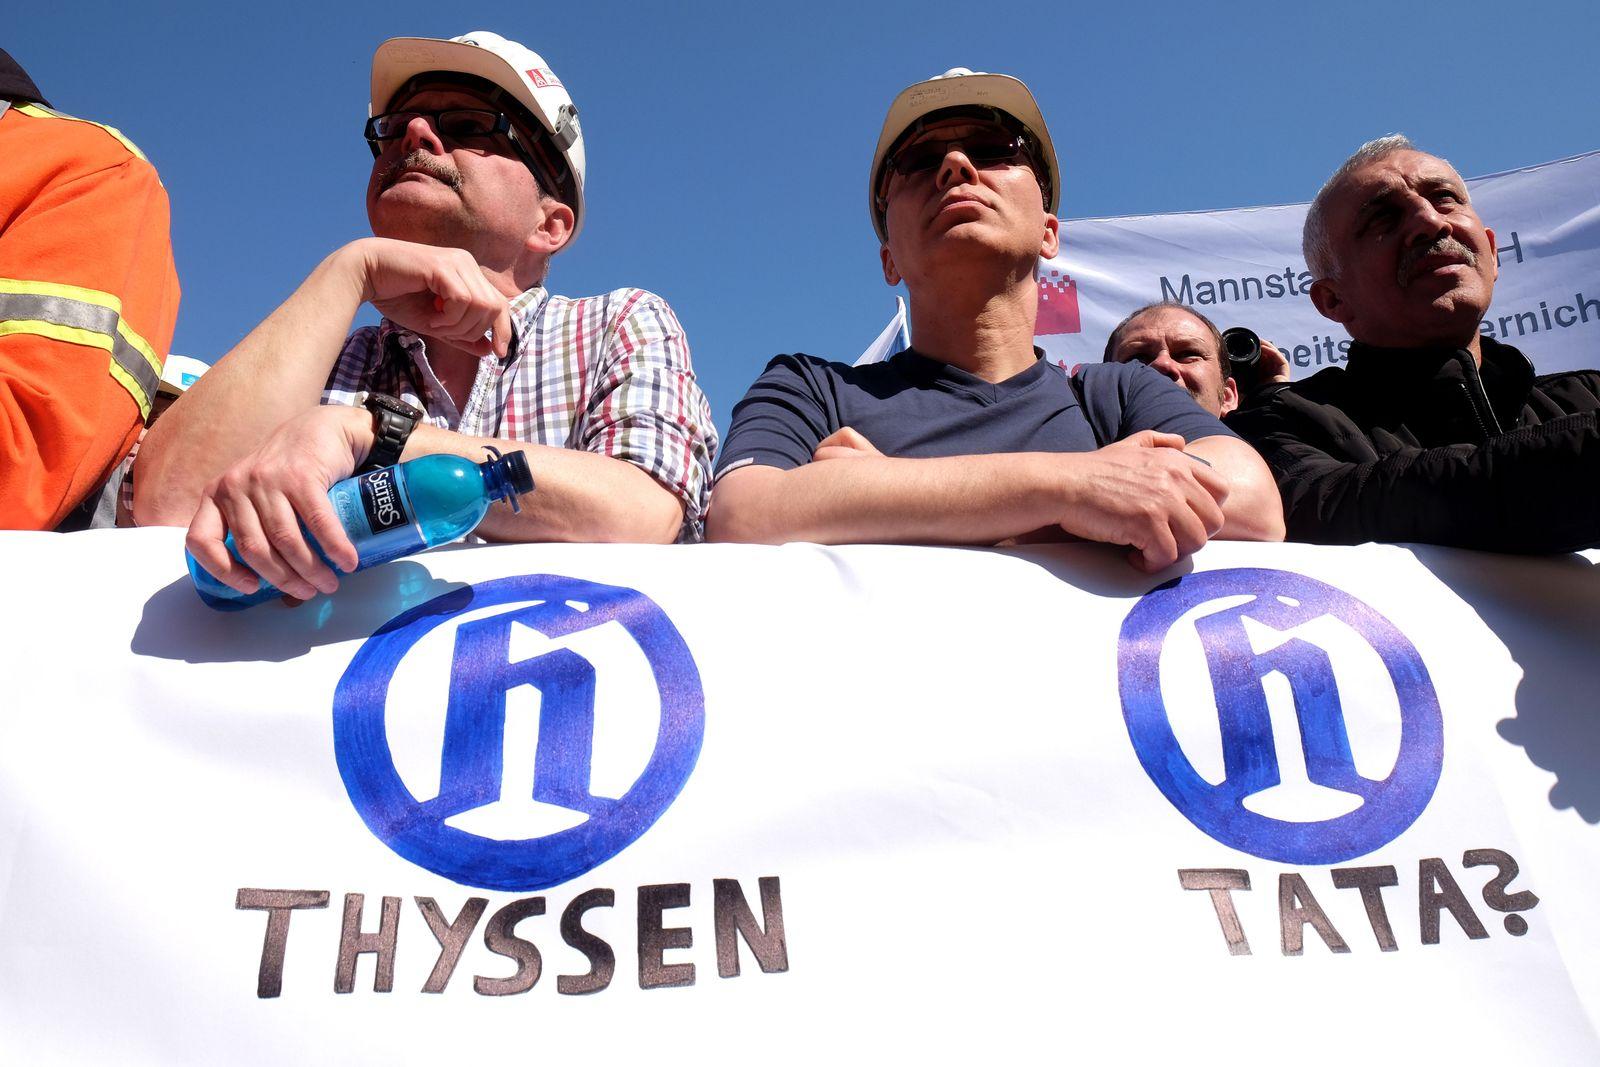 Demo Stahl Thyssen Tata